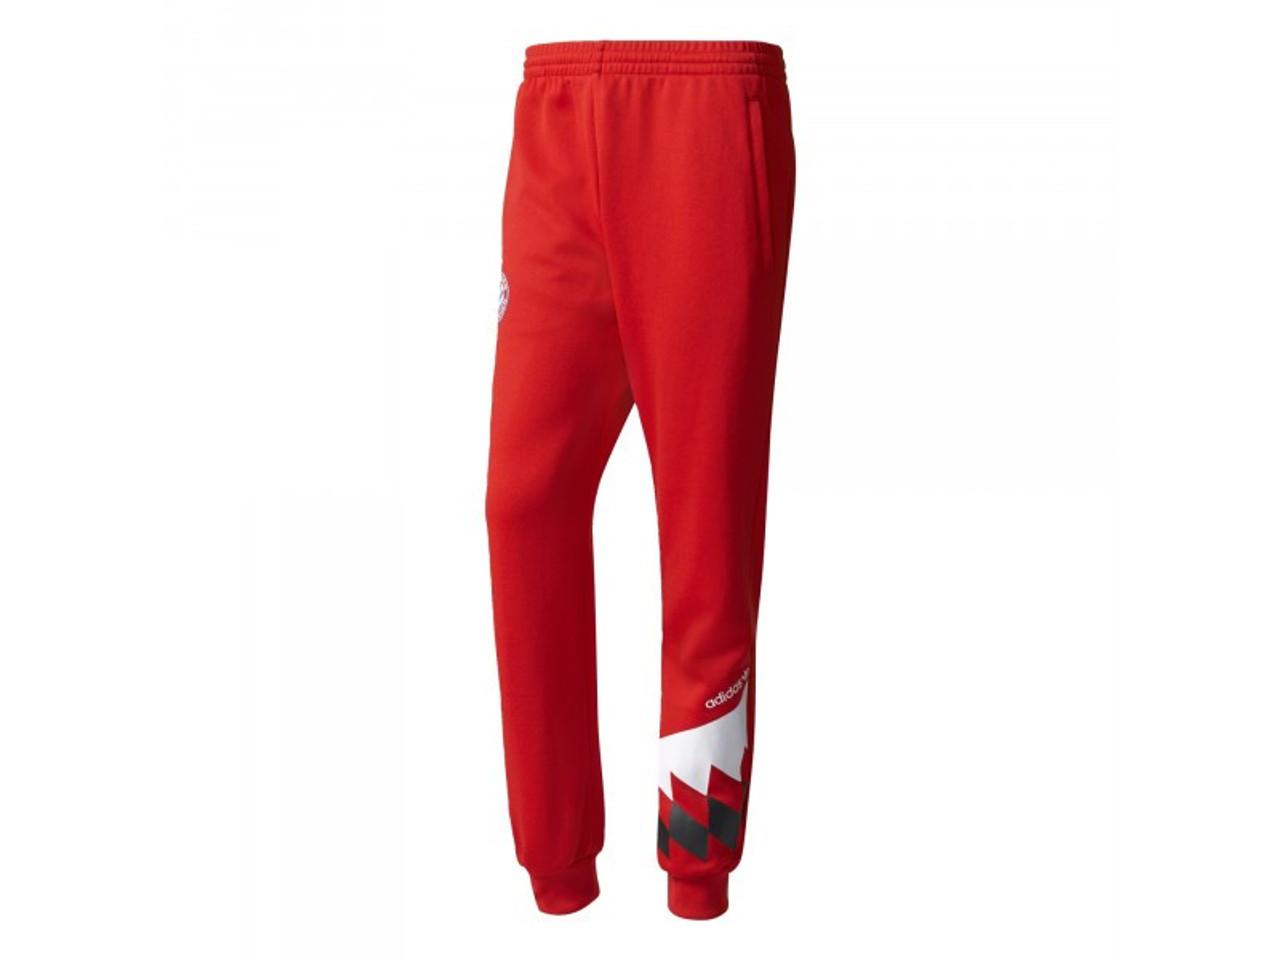 a911f42cb04d5 Adidas Pants Red – Fashionsneakers.club